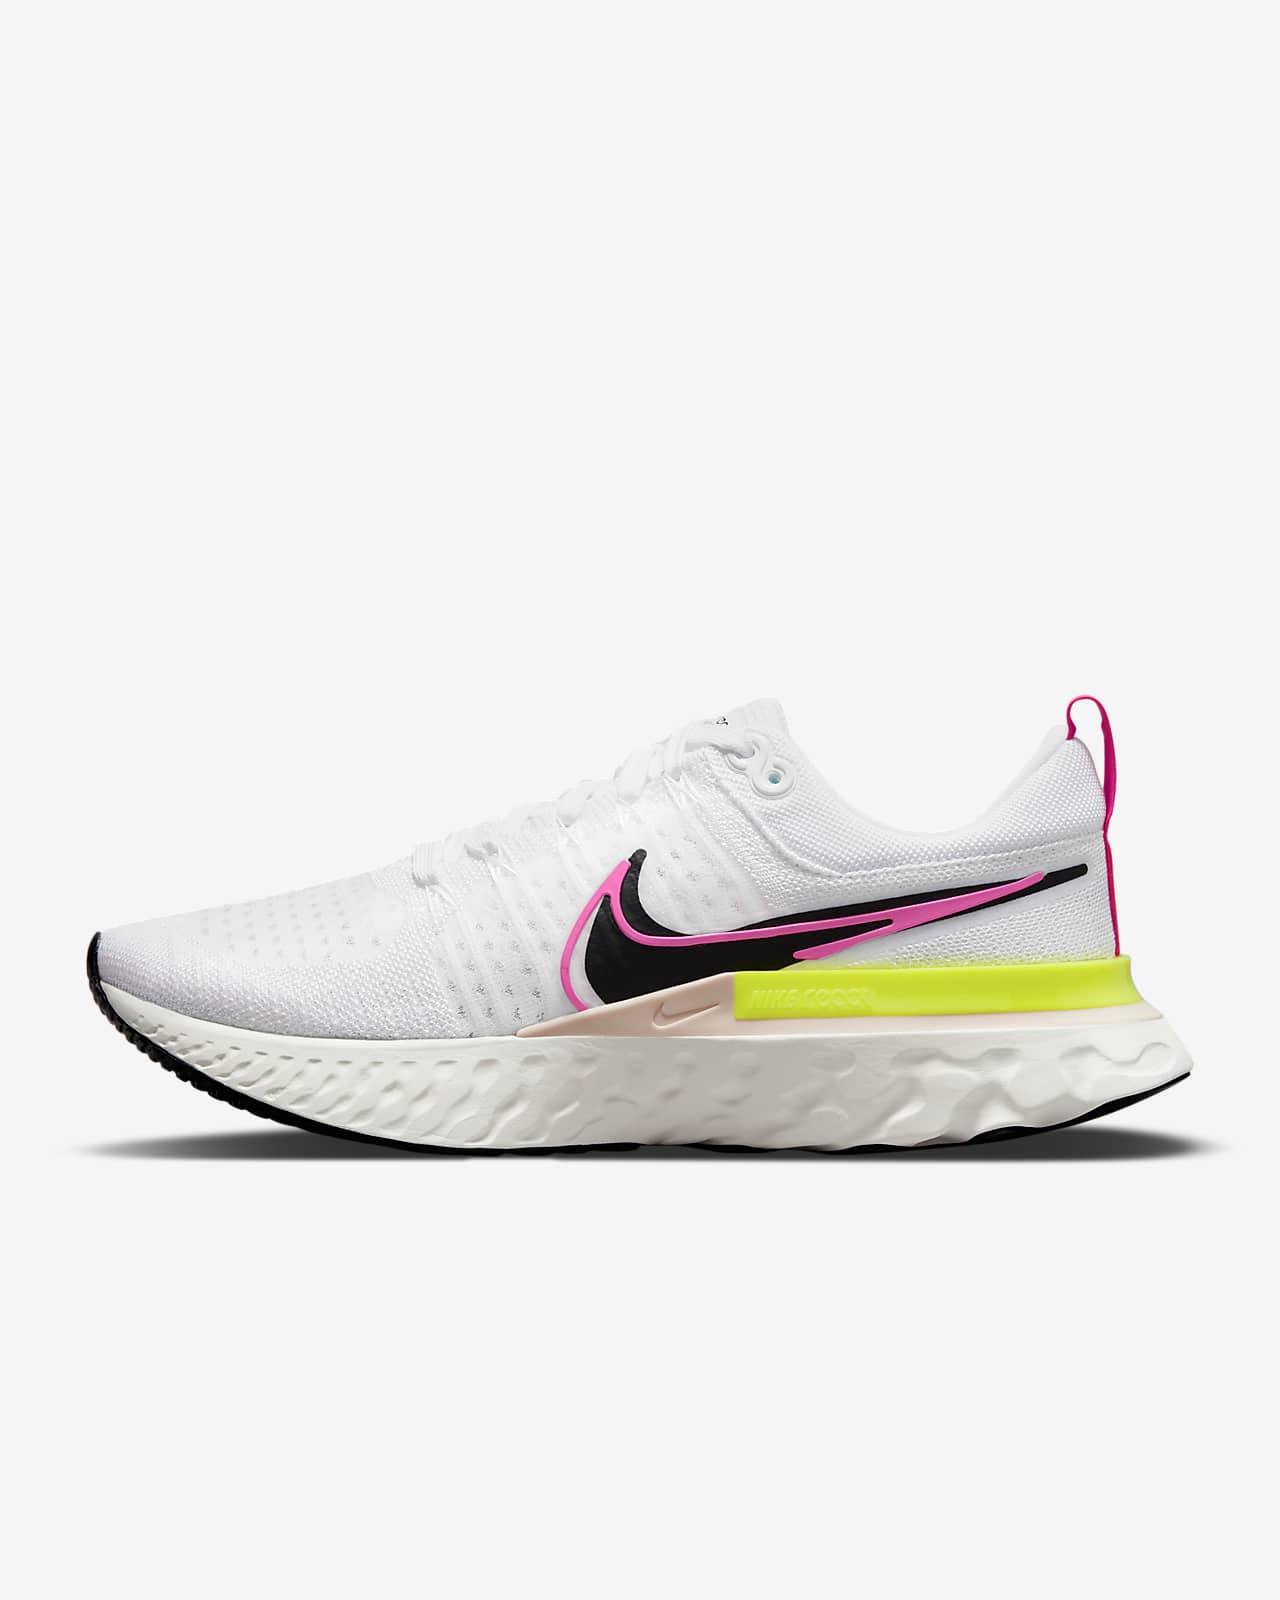 Мужские кроссовки для бега по шоссе Nike React Infinity Run Flyknit 2